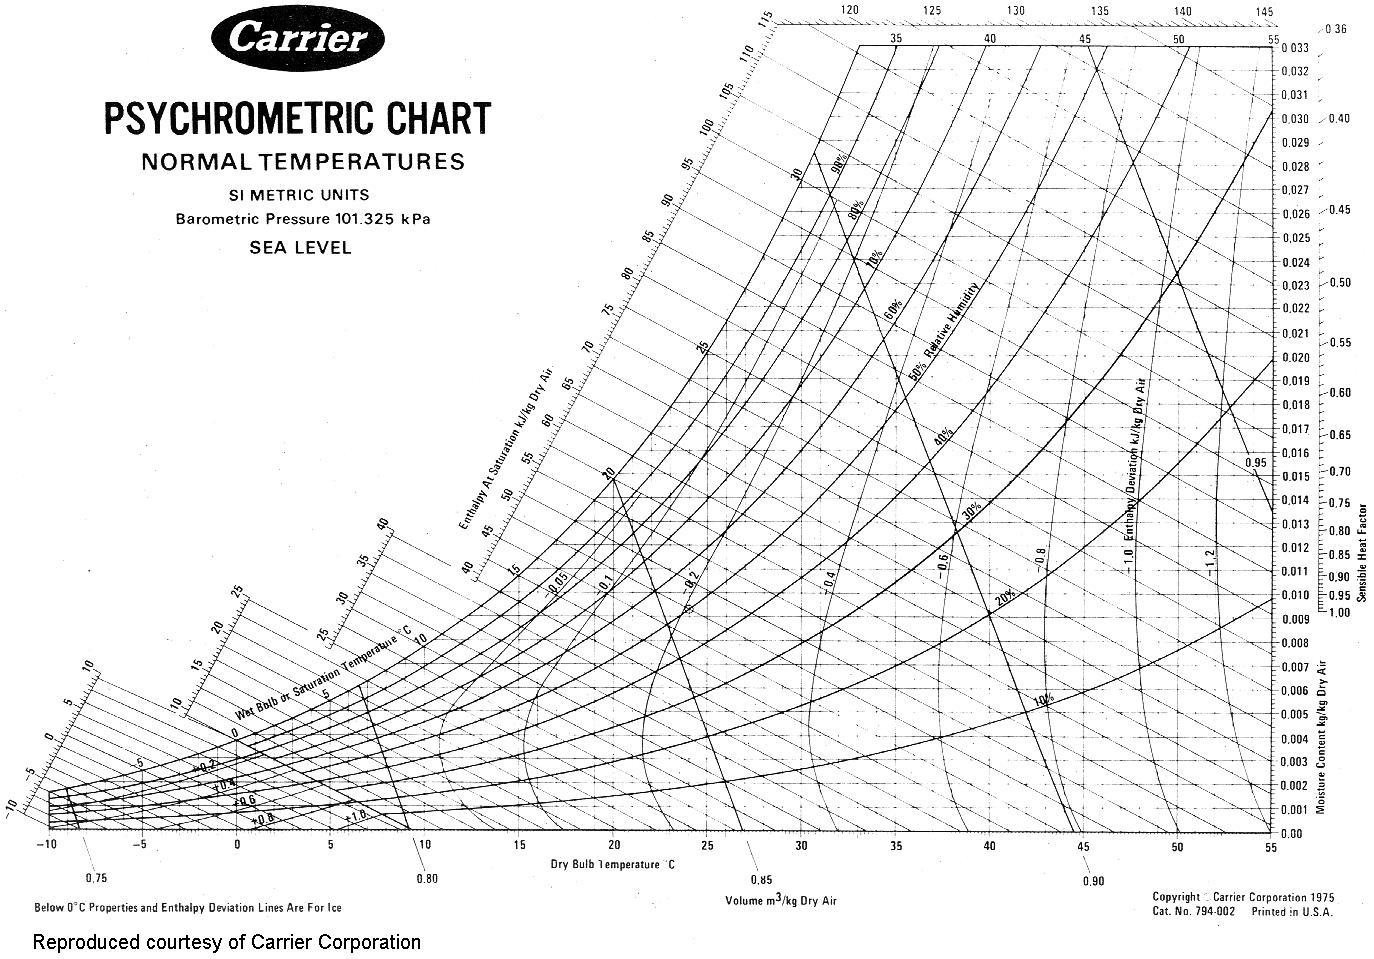 Psychrometric Chart Download Pdf Printable 1 - Cialisnets - Printable Psychrometric Chart Free